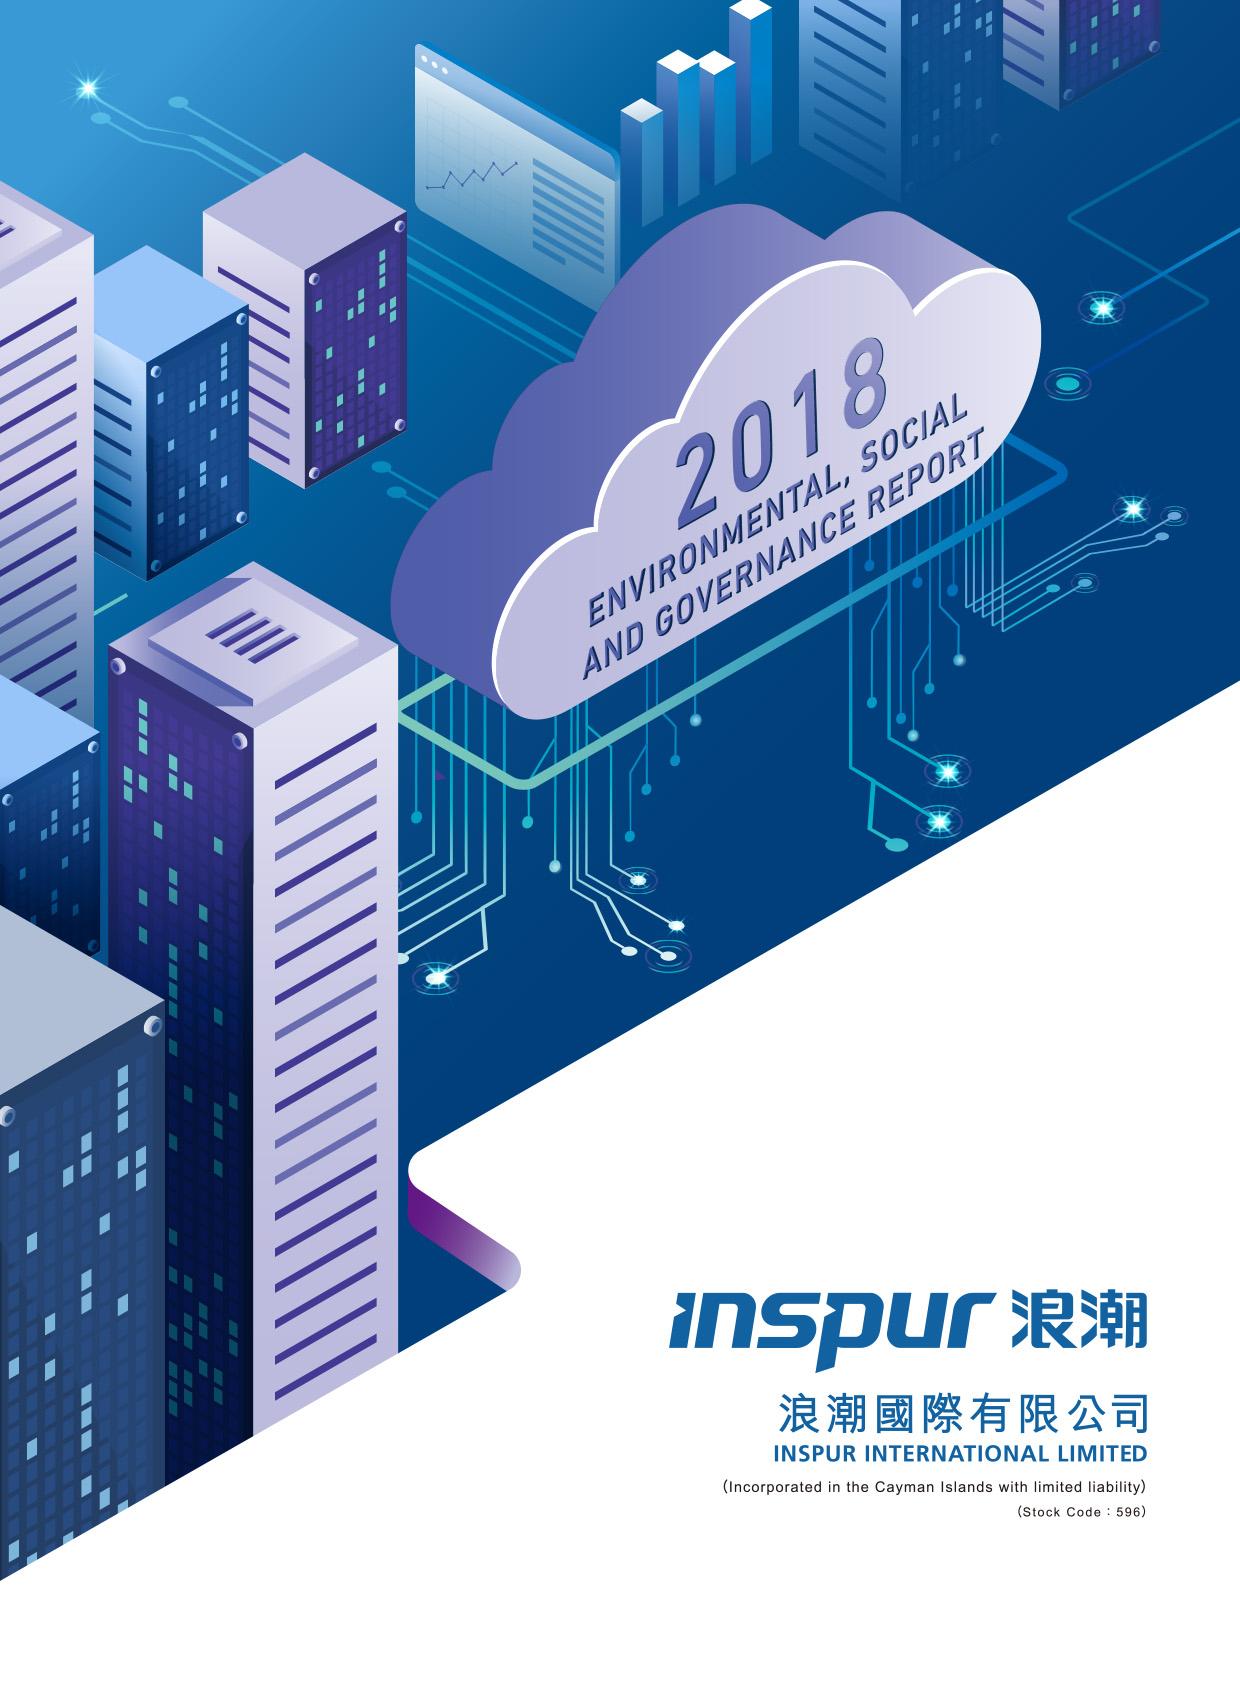 INSPUR INTERNATIONAL LIMITED ESG